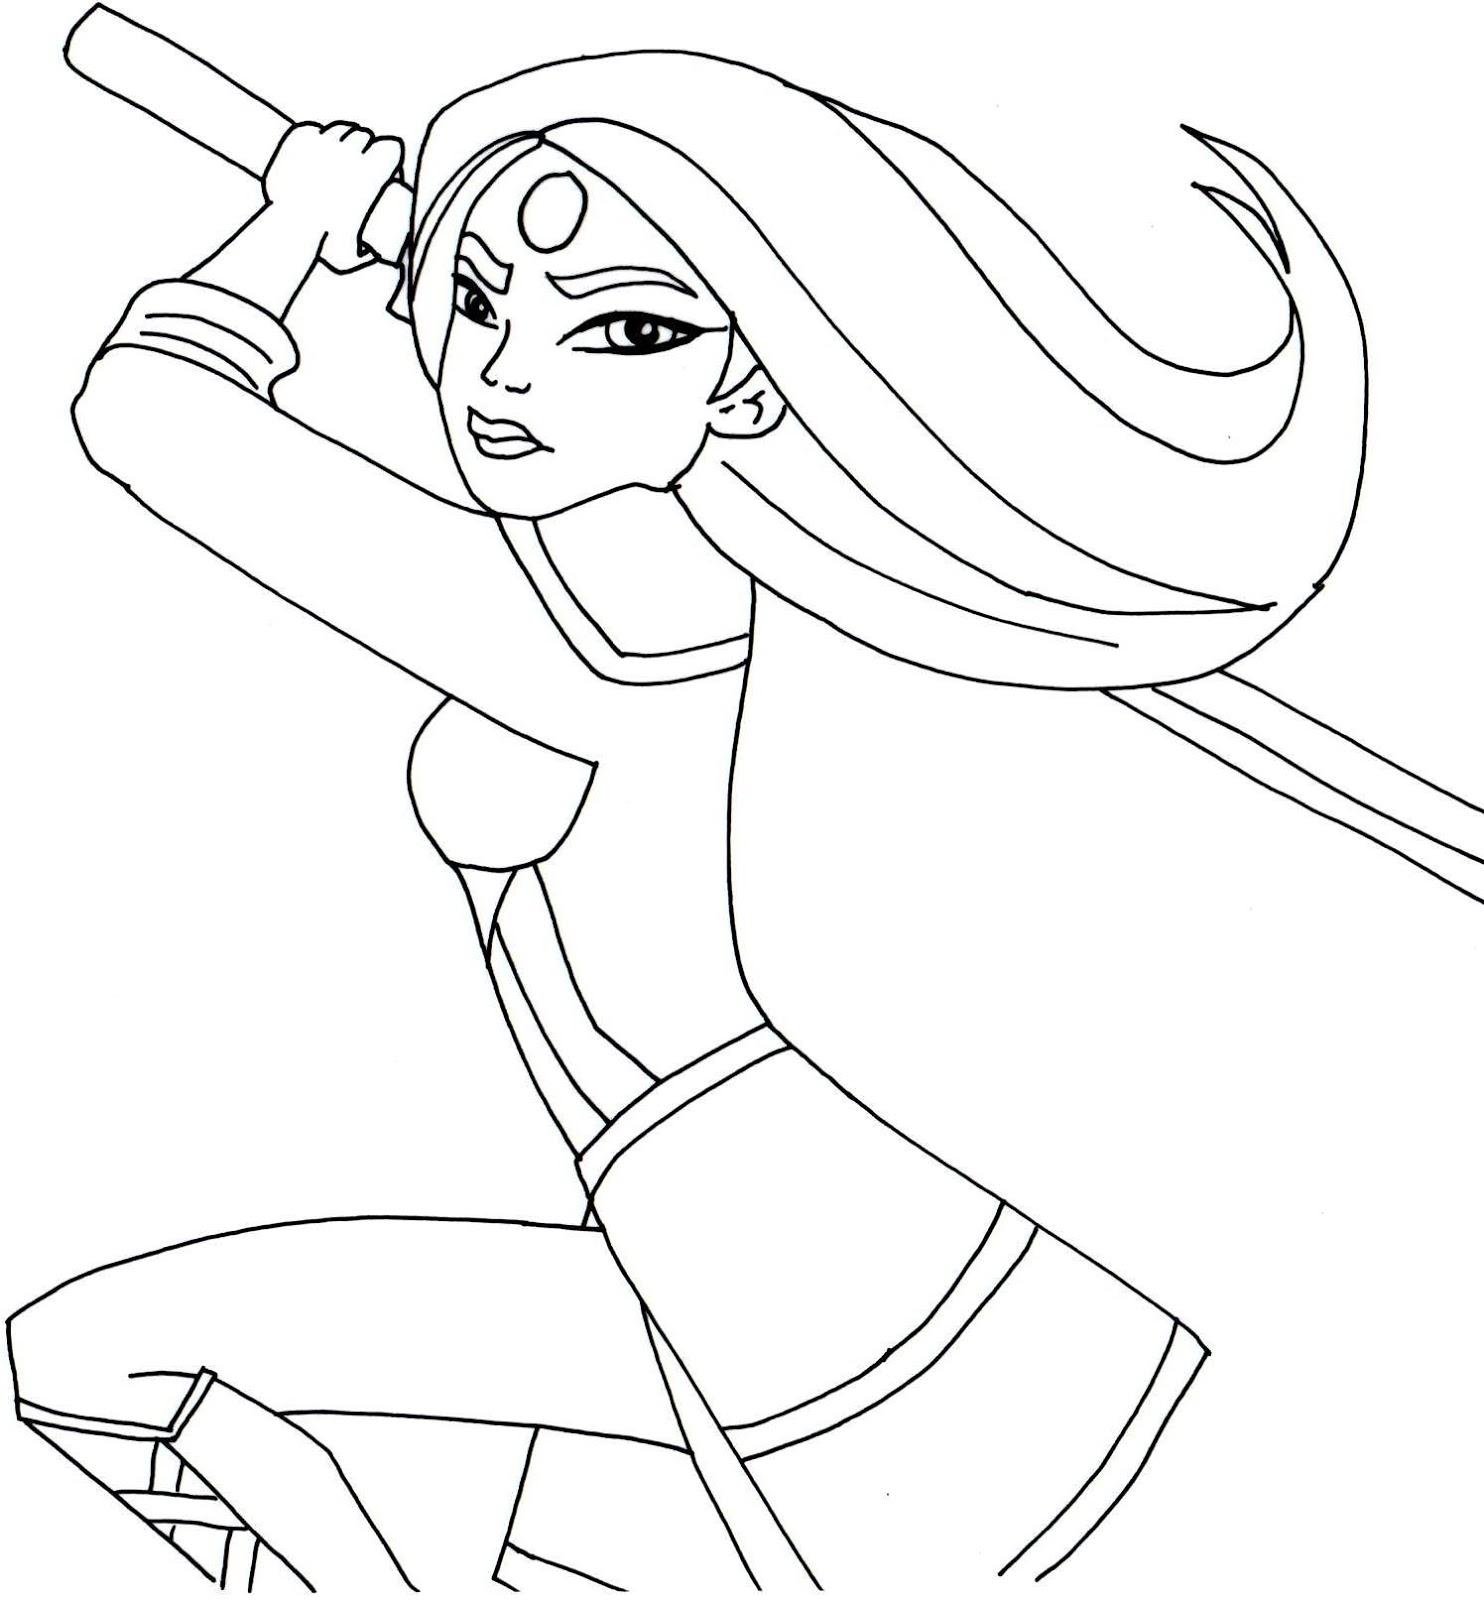 katana coloring page free printable super hero high coloring pages katana